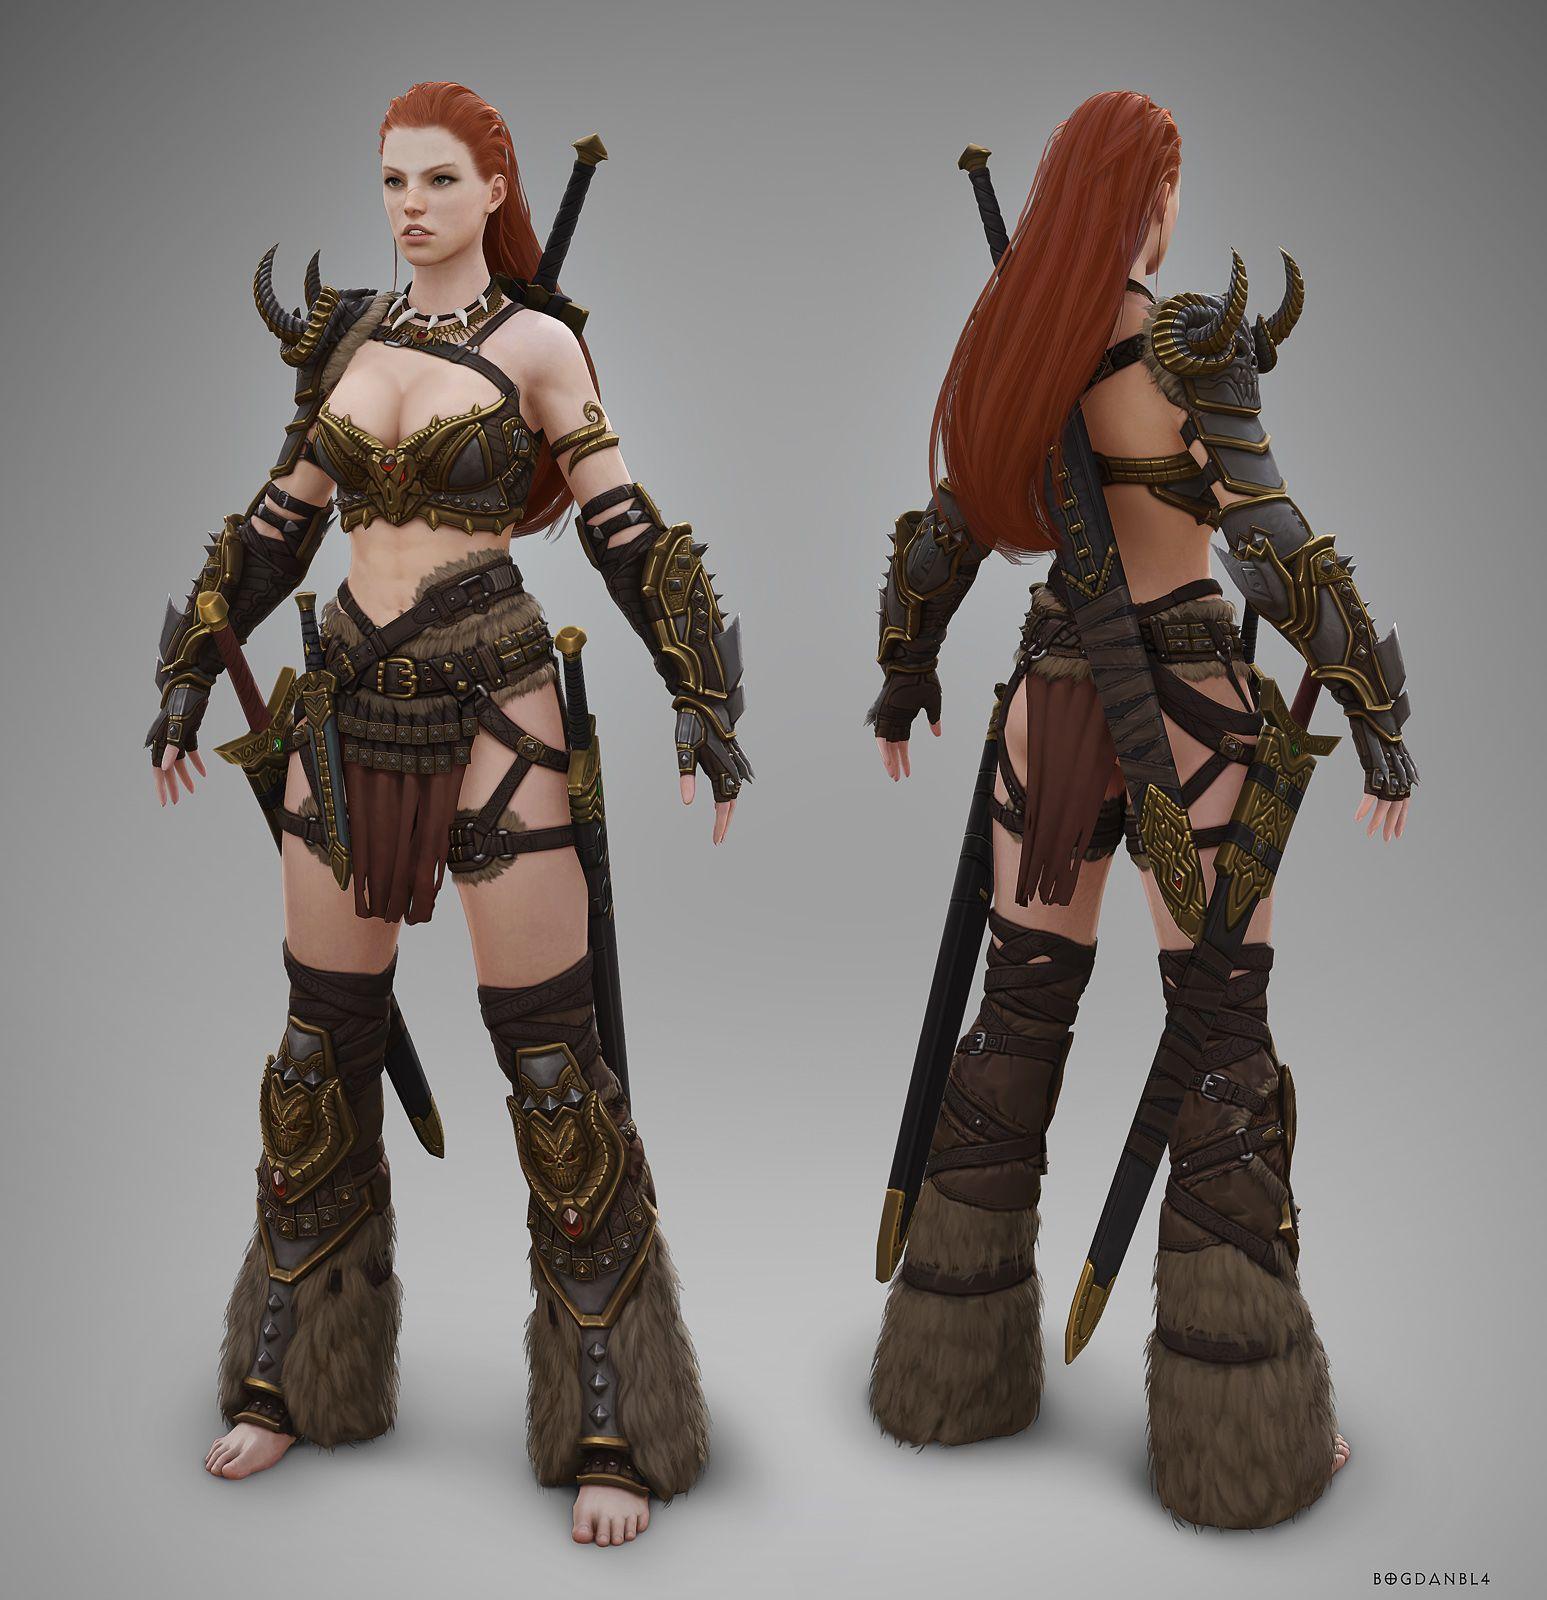 Barbarian Women Concept Art